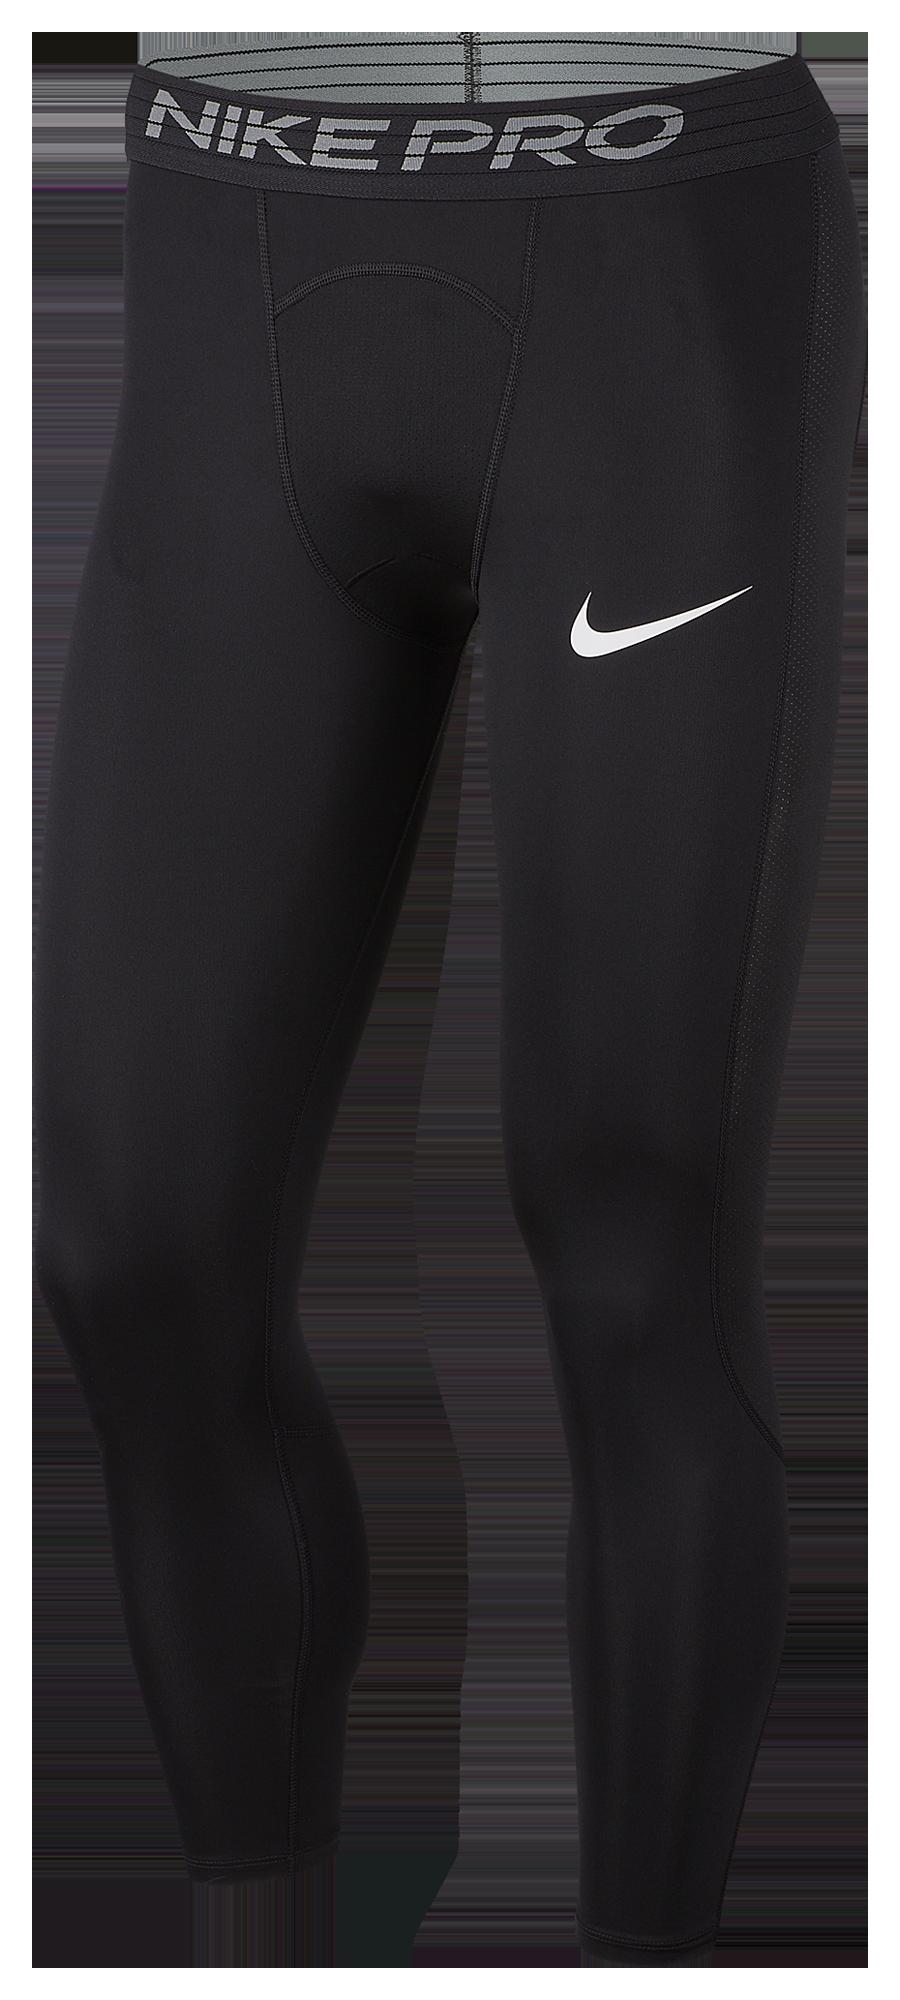 NUMBERS ATHLETICS Full Length Tights Purple, Gray, White CAMO Vanadium Boys Mens Football Basketball Compression Tights Sports Pants Baselayer Leggings to Match Uniforms